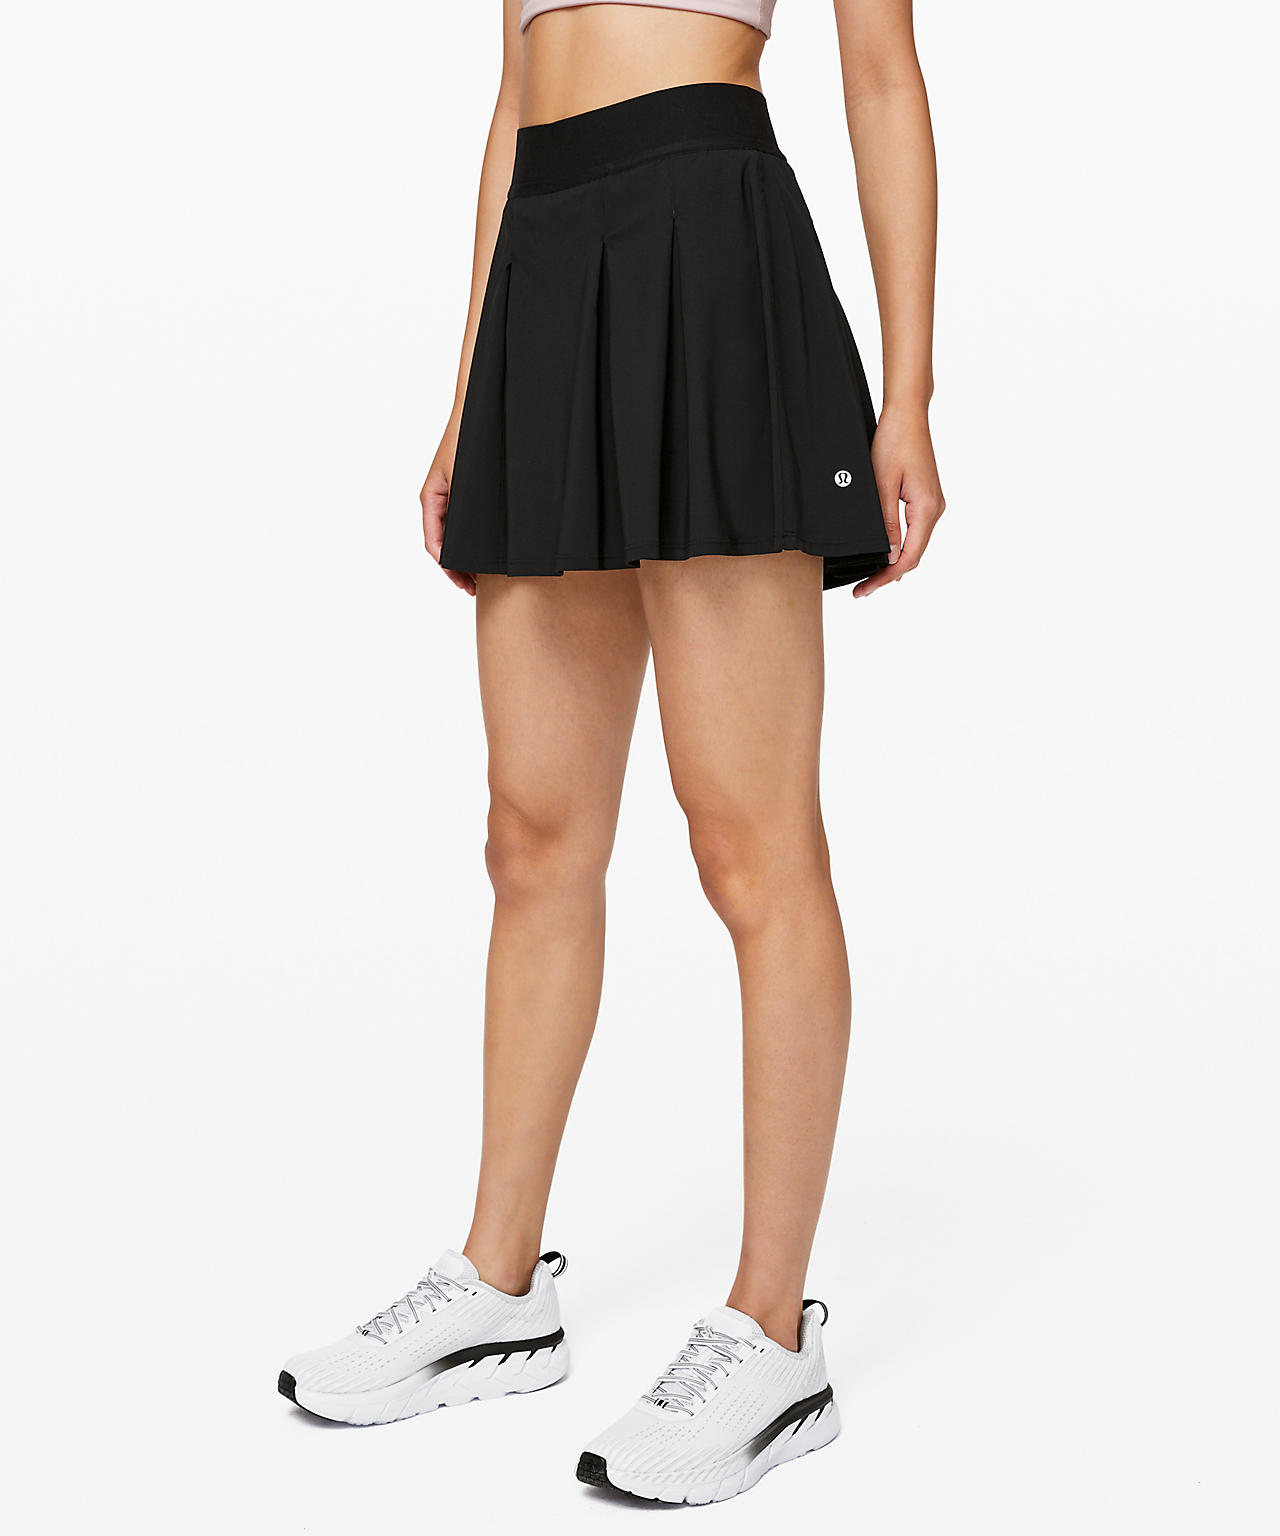 Tennis Time Skirt